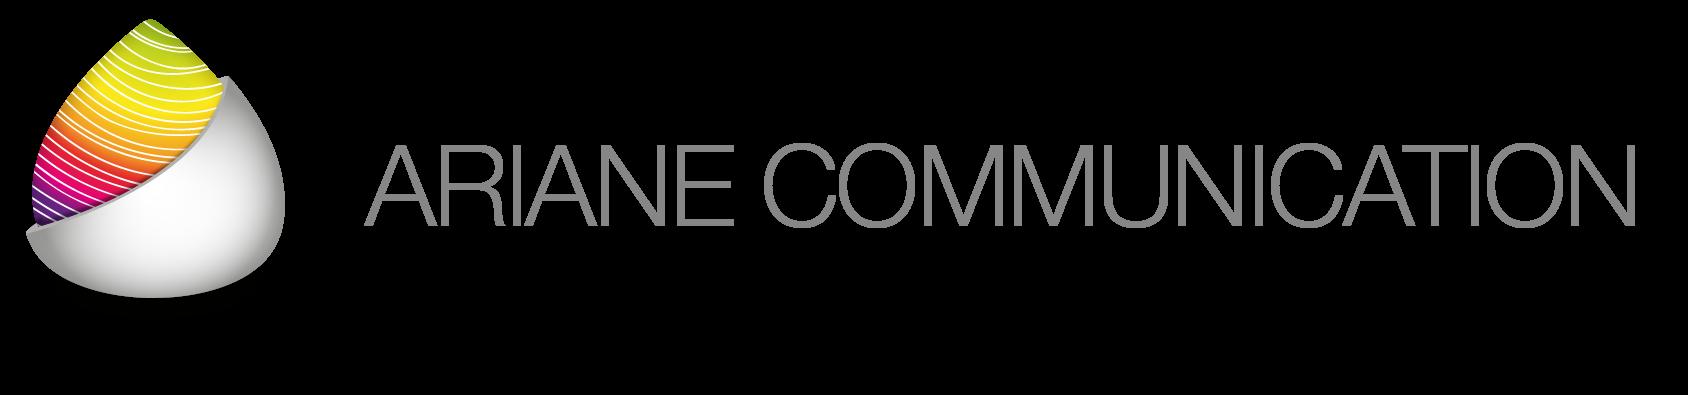 Ariane Communication